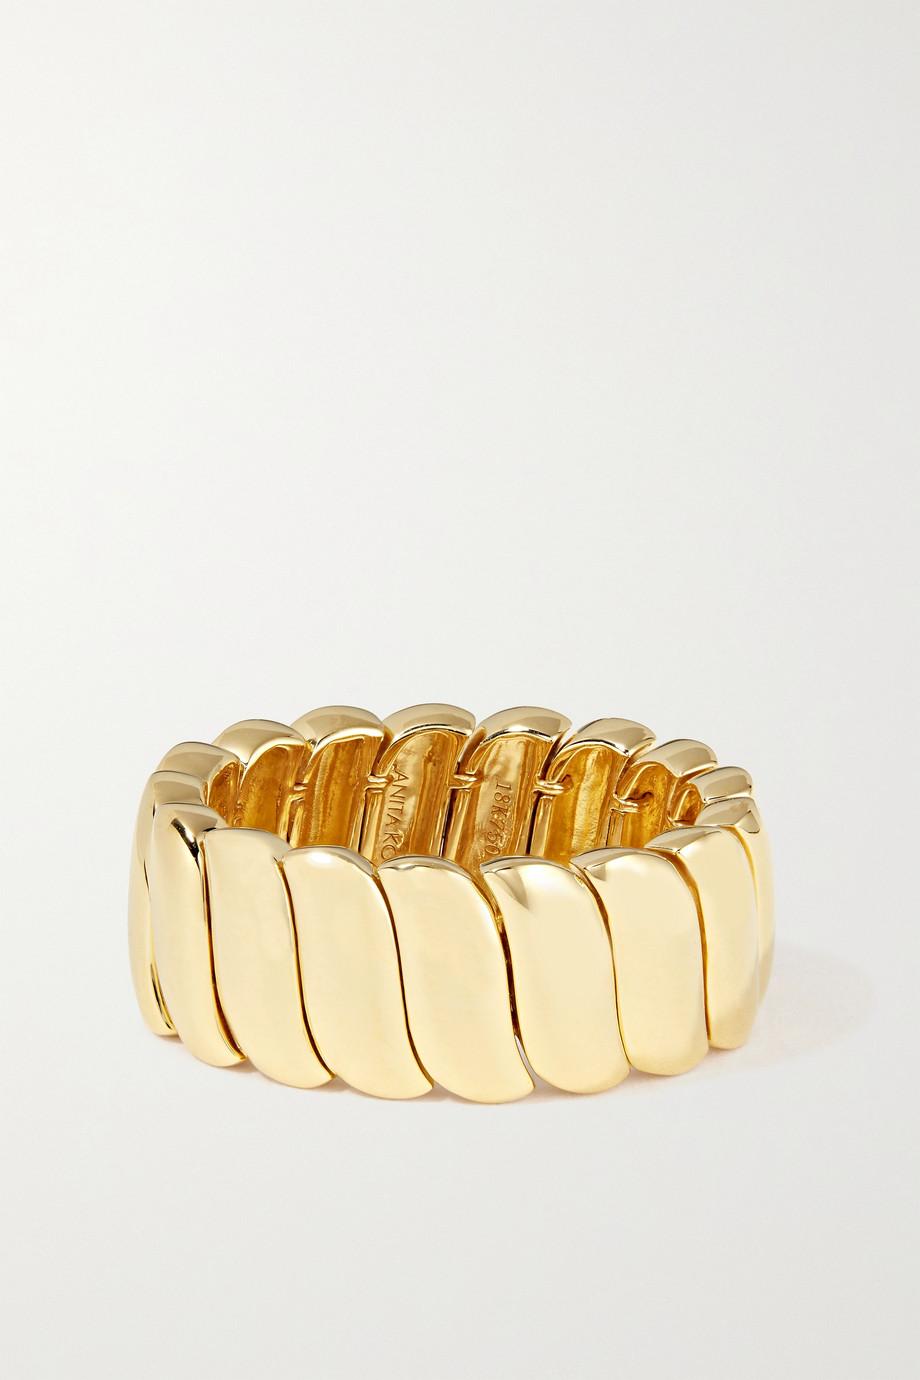 Anita Ko Bague en or 18 carats (750/1000) Large Zoe